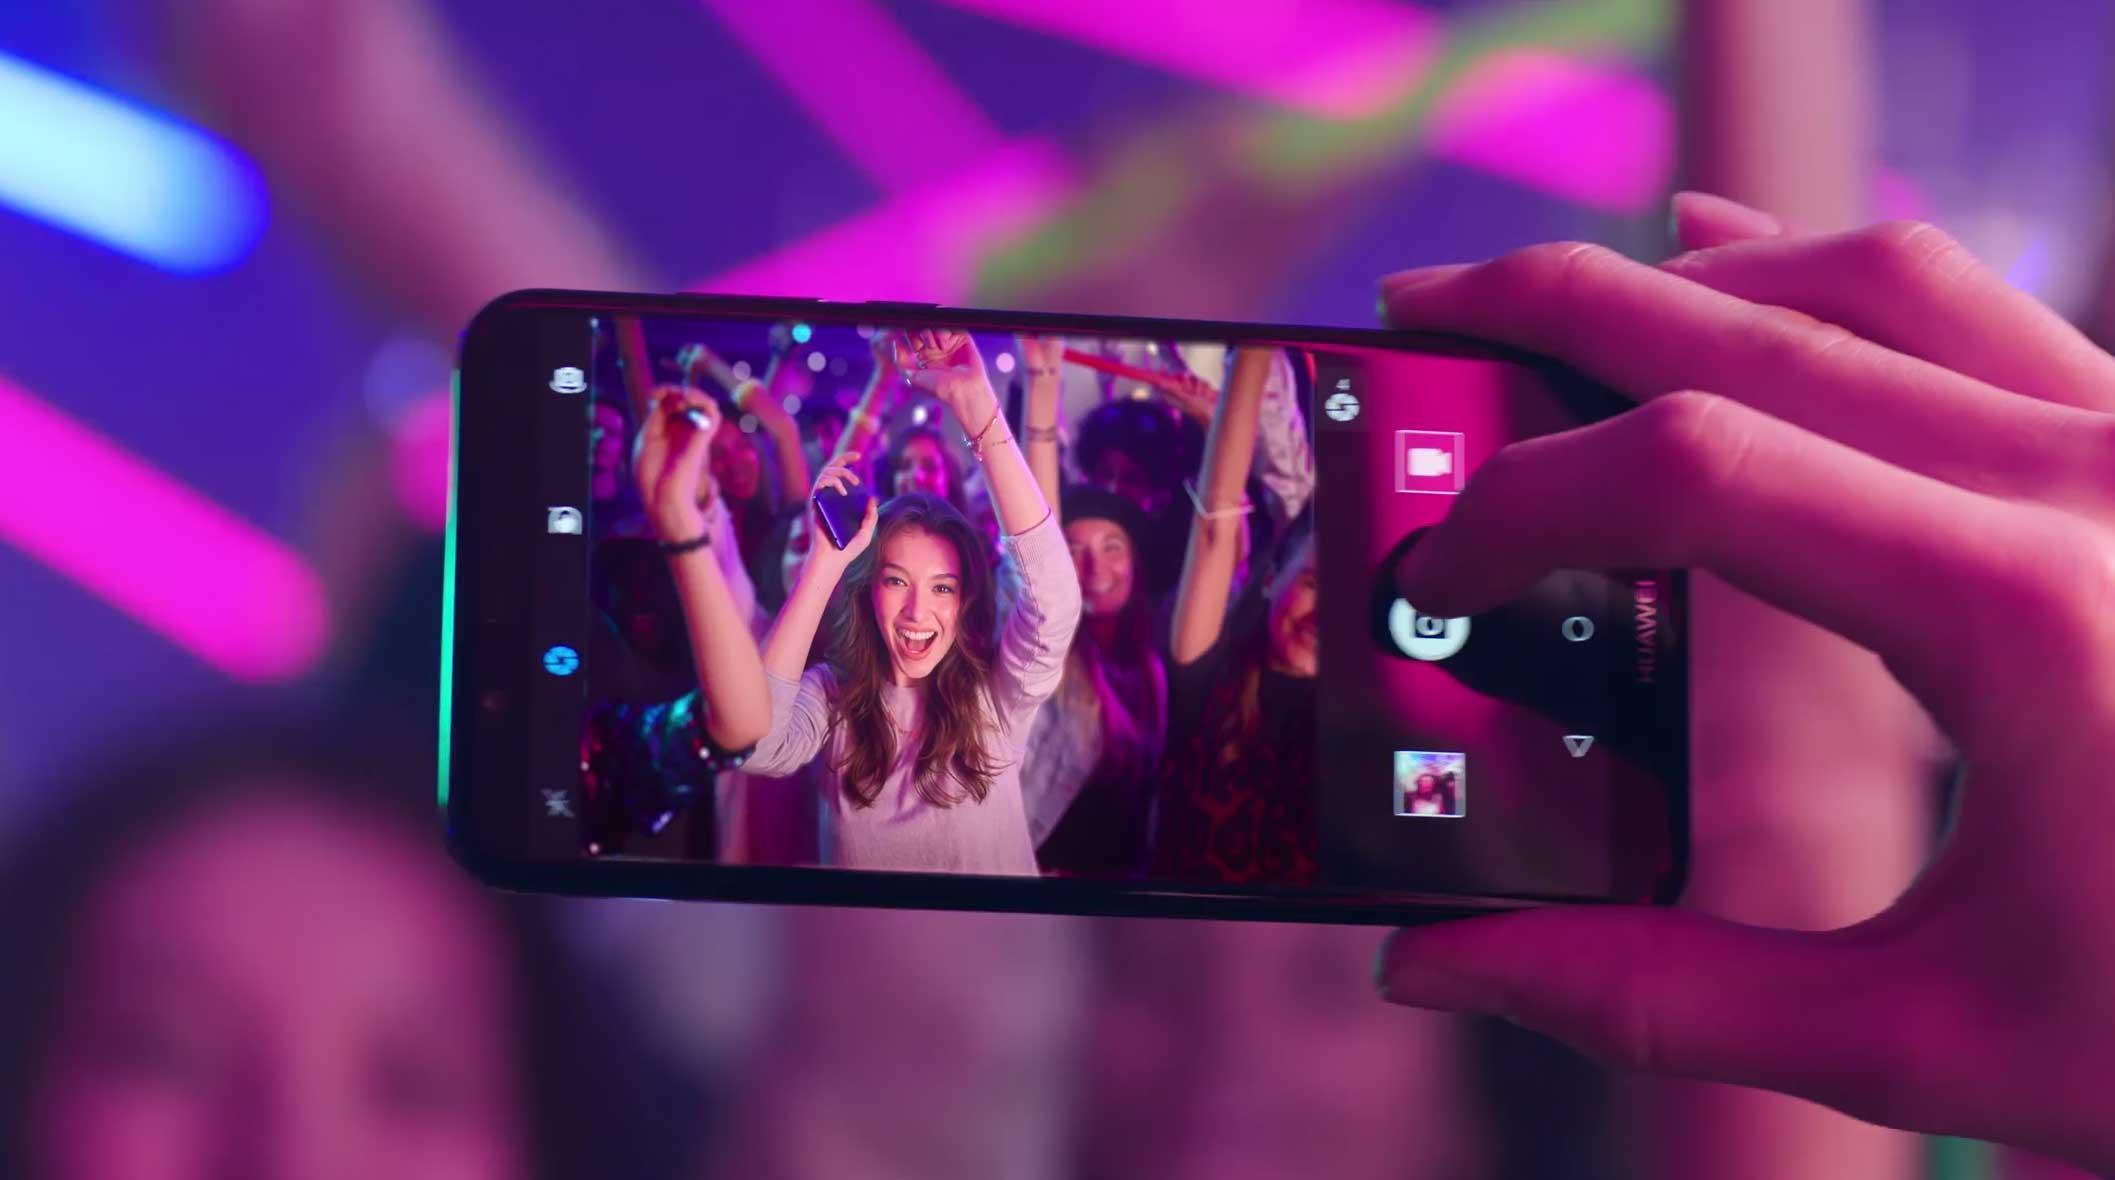 فيديو منتج huawei y7 prime 2018 قم بإنجازات أكبر